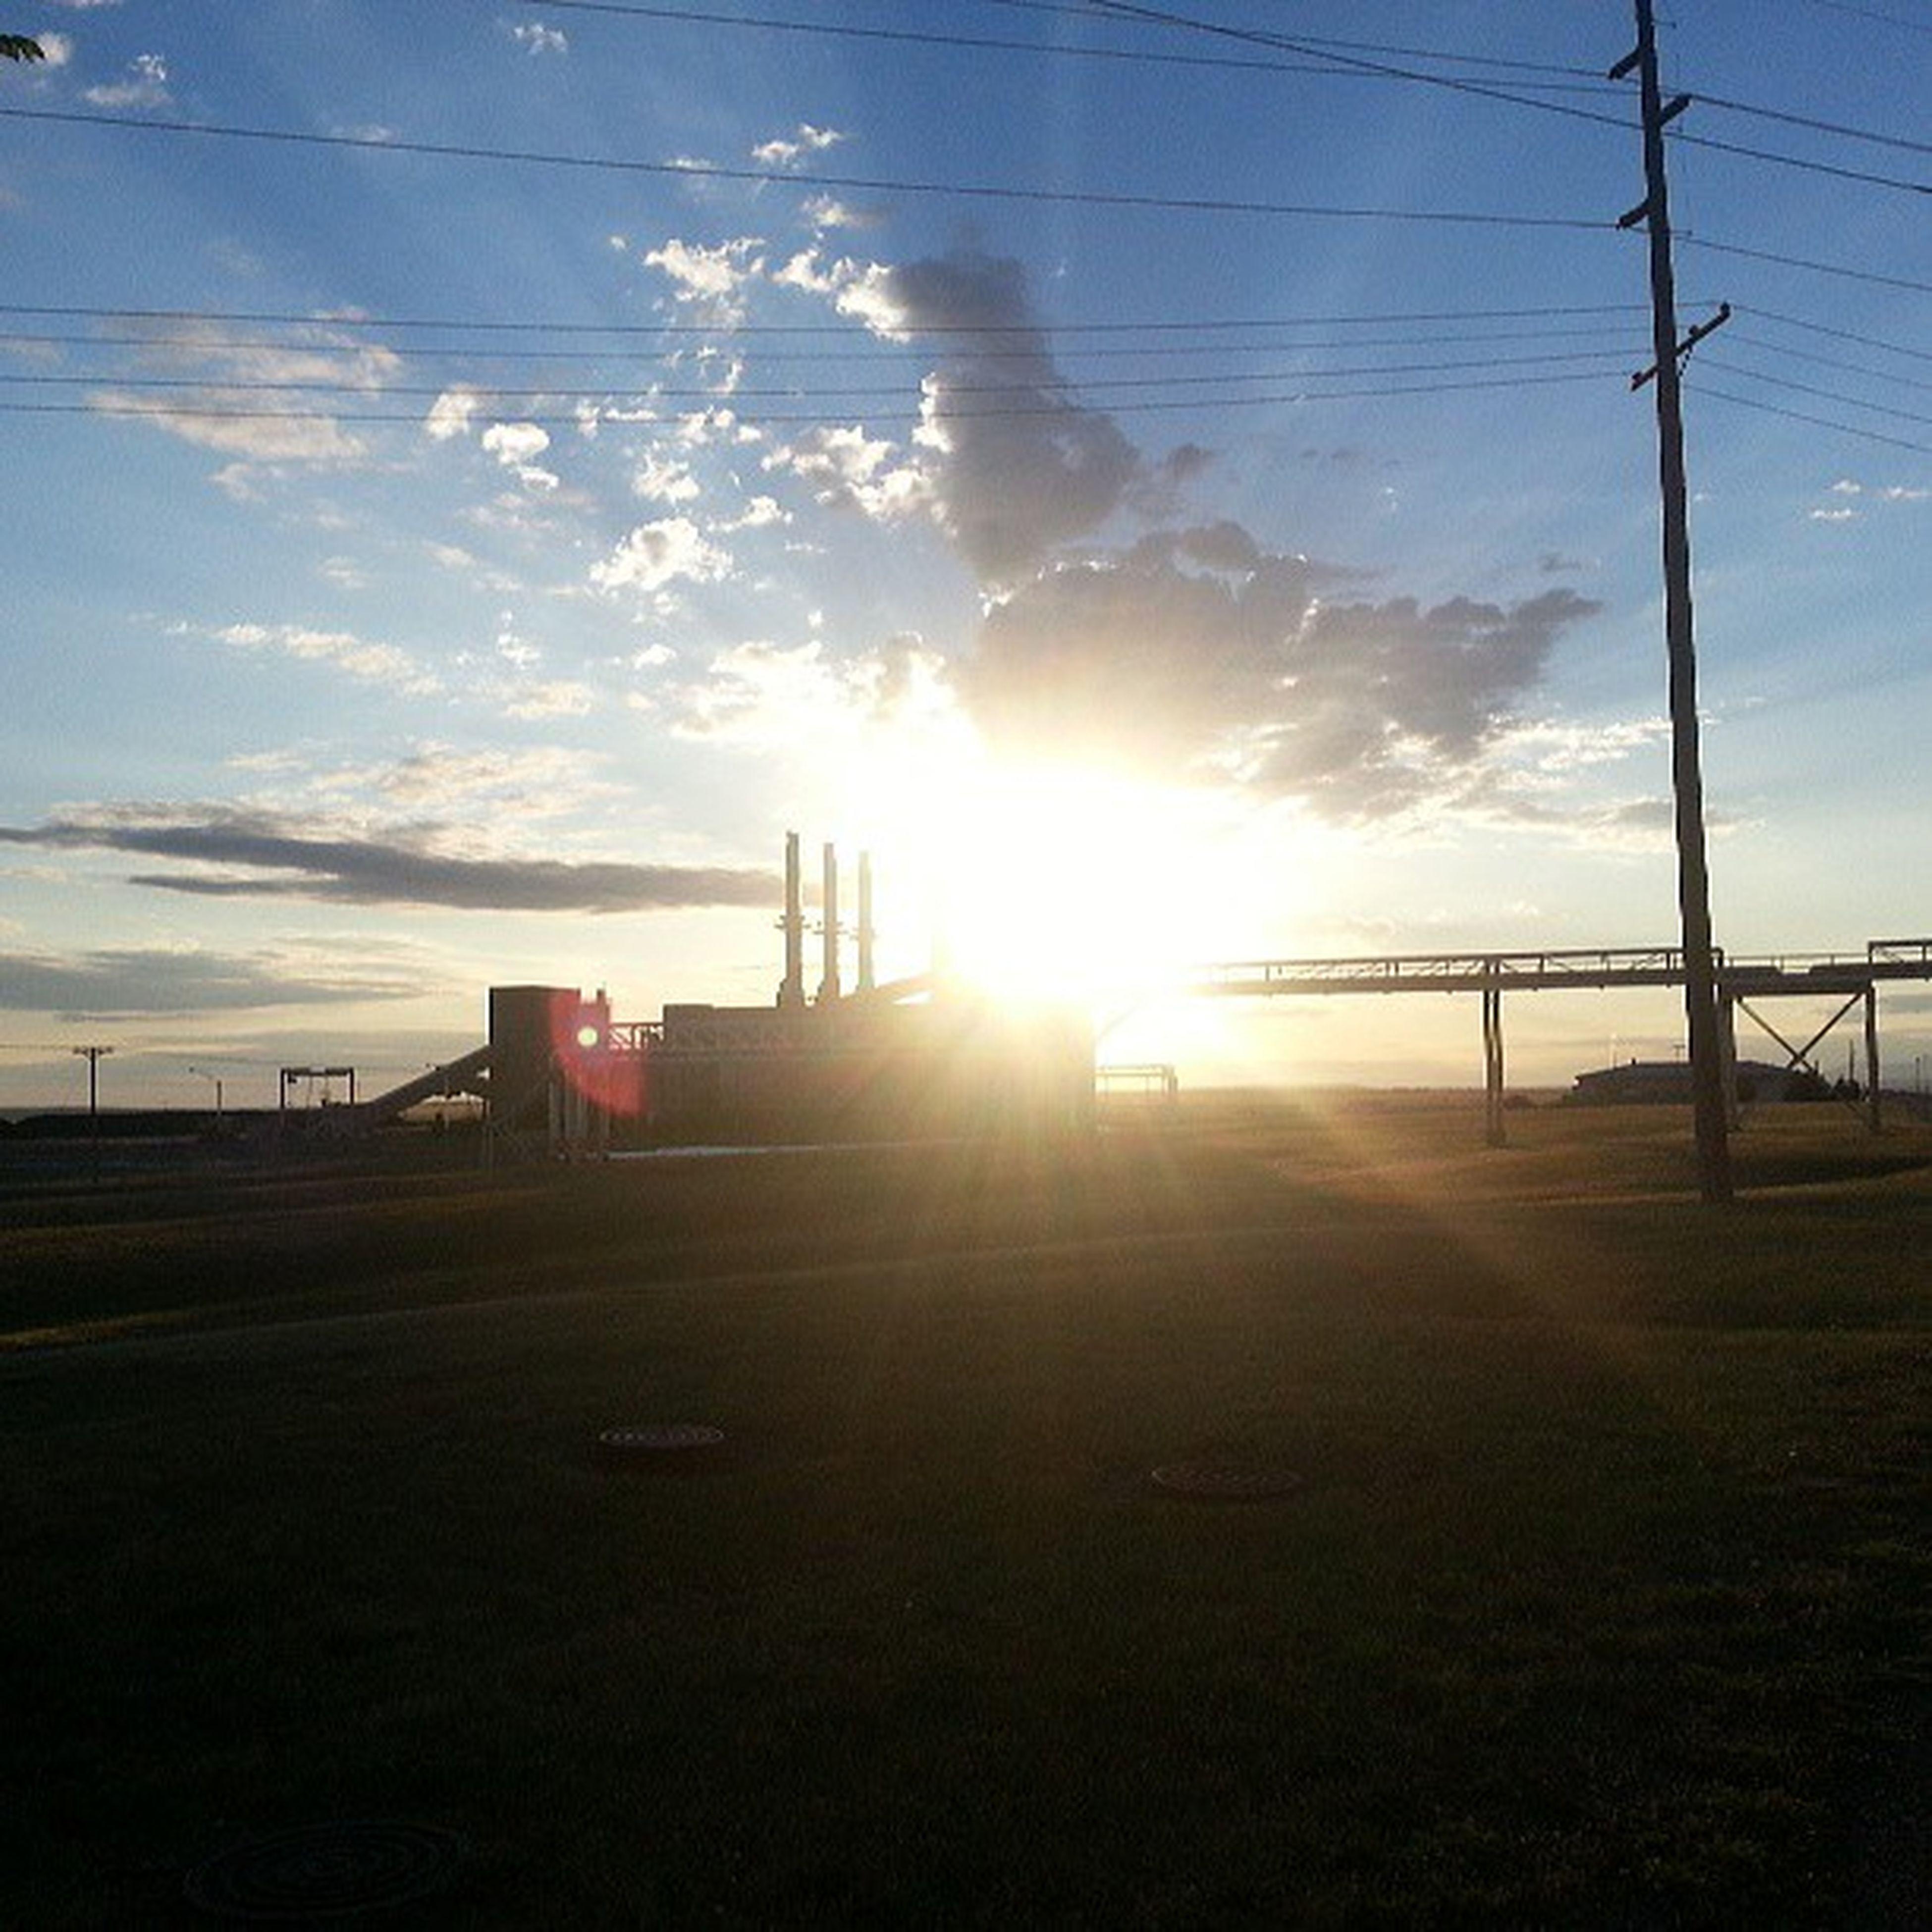 sun, sky, sunset, sunbeam, sunlight, cloud - sky, built structure, architecture, lens flare, silhouette, building exterior, cloud, electricity pylon, power line, nature, cloudy, tranquility, outdoors, tranquil scene, scenics